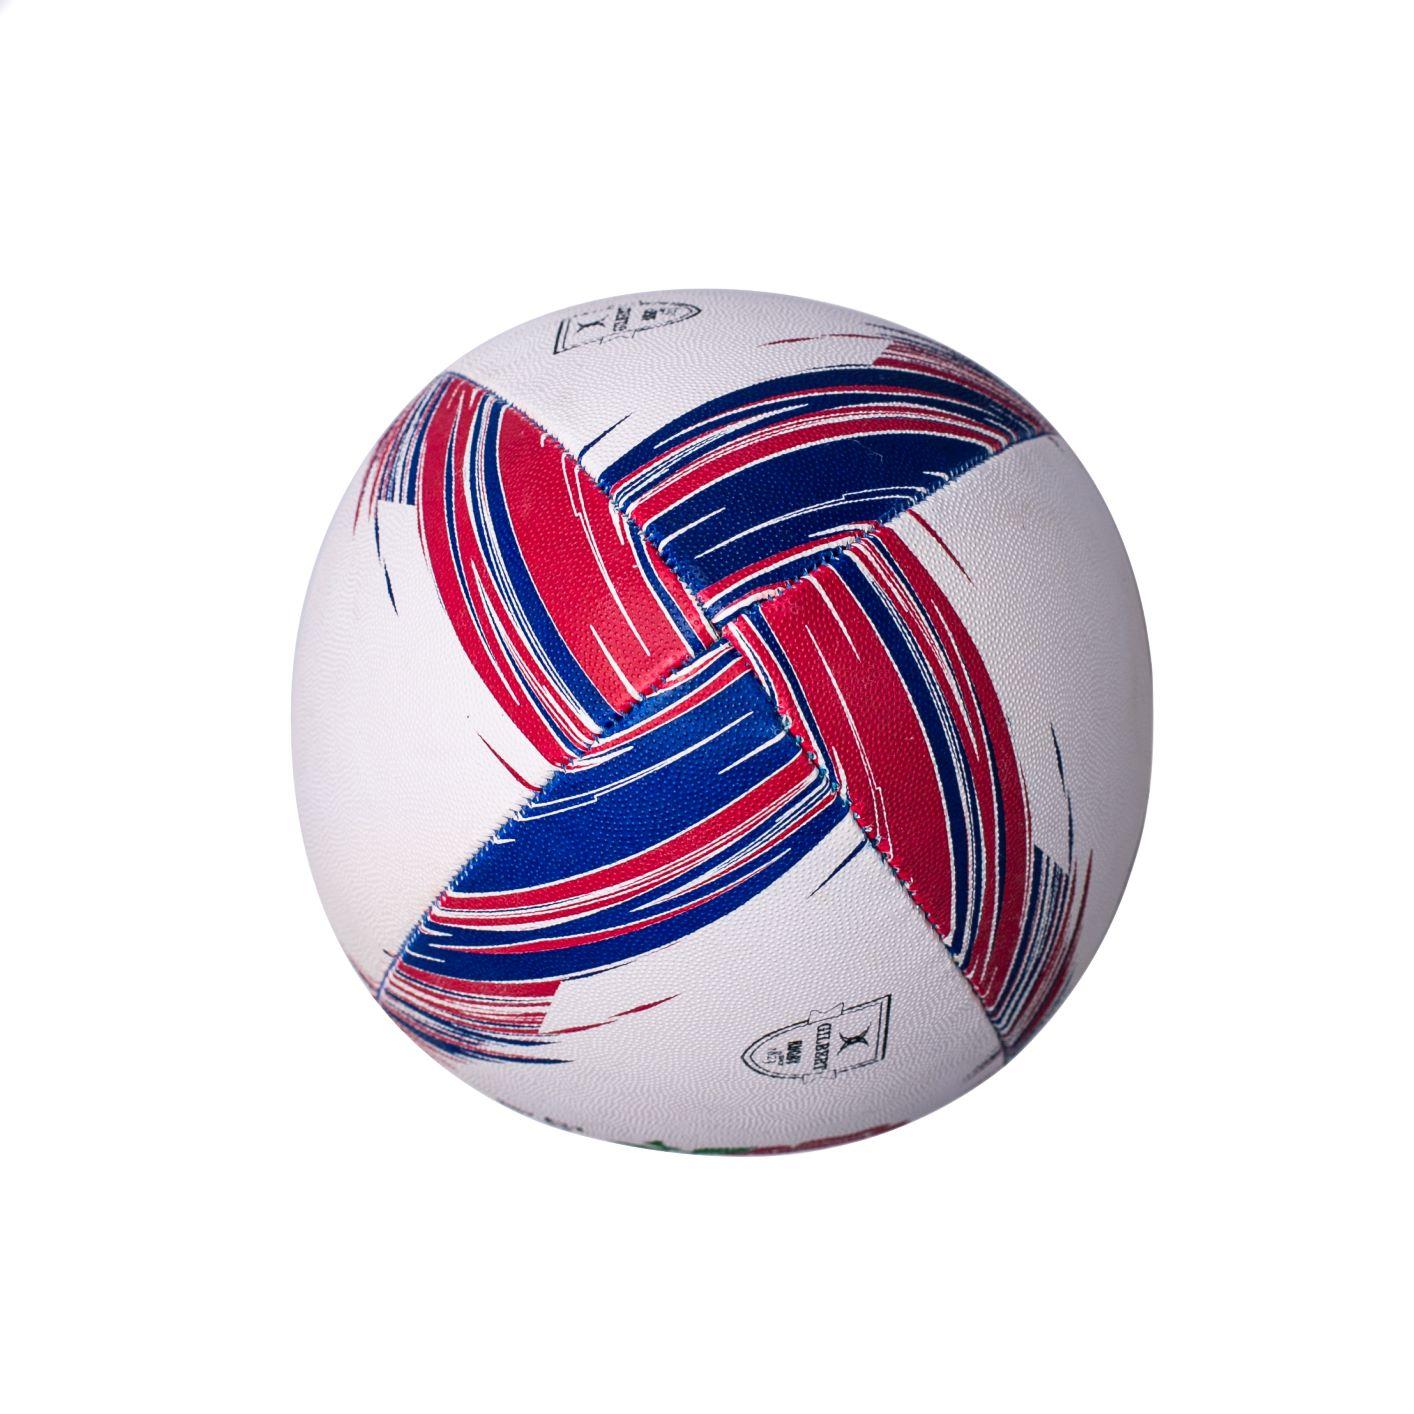 Bola de Rugby Gilbert Supporter England - Tamanho 5